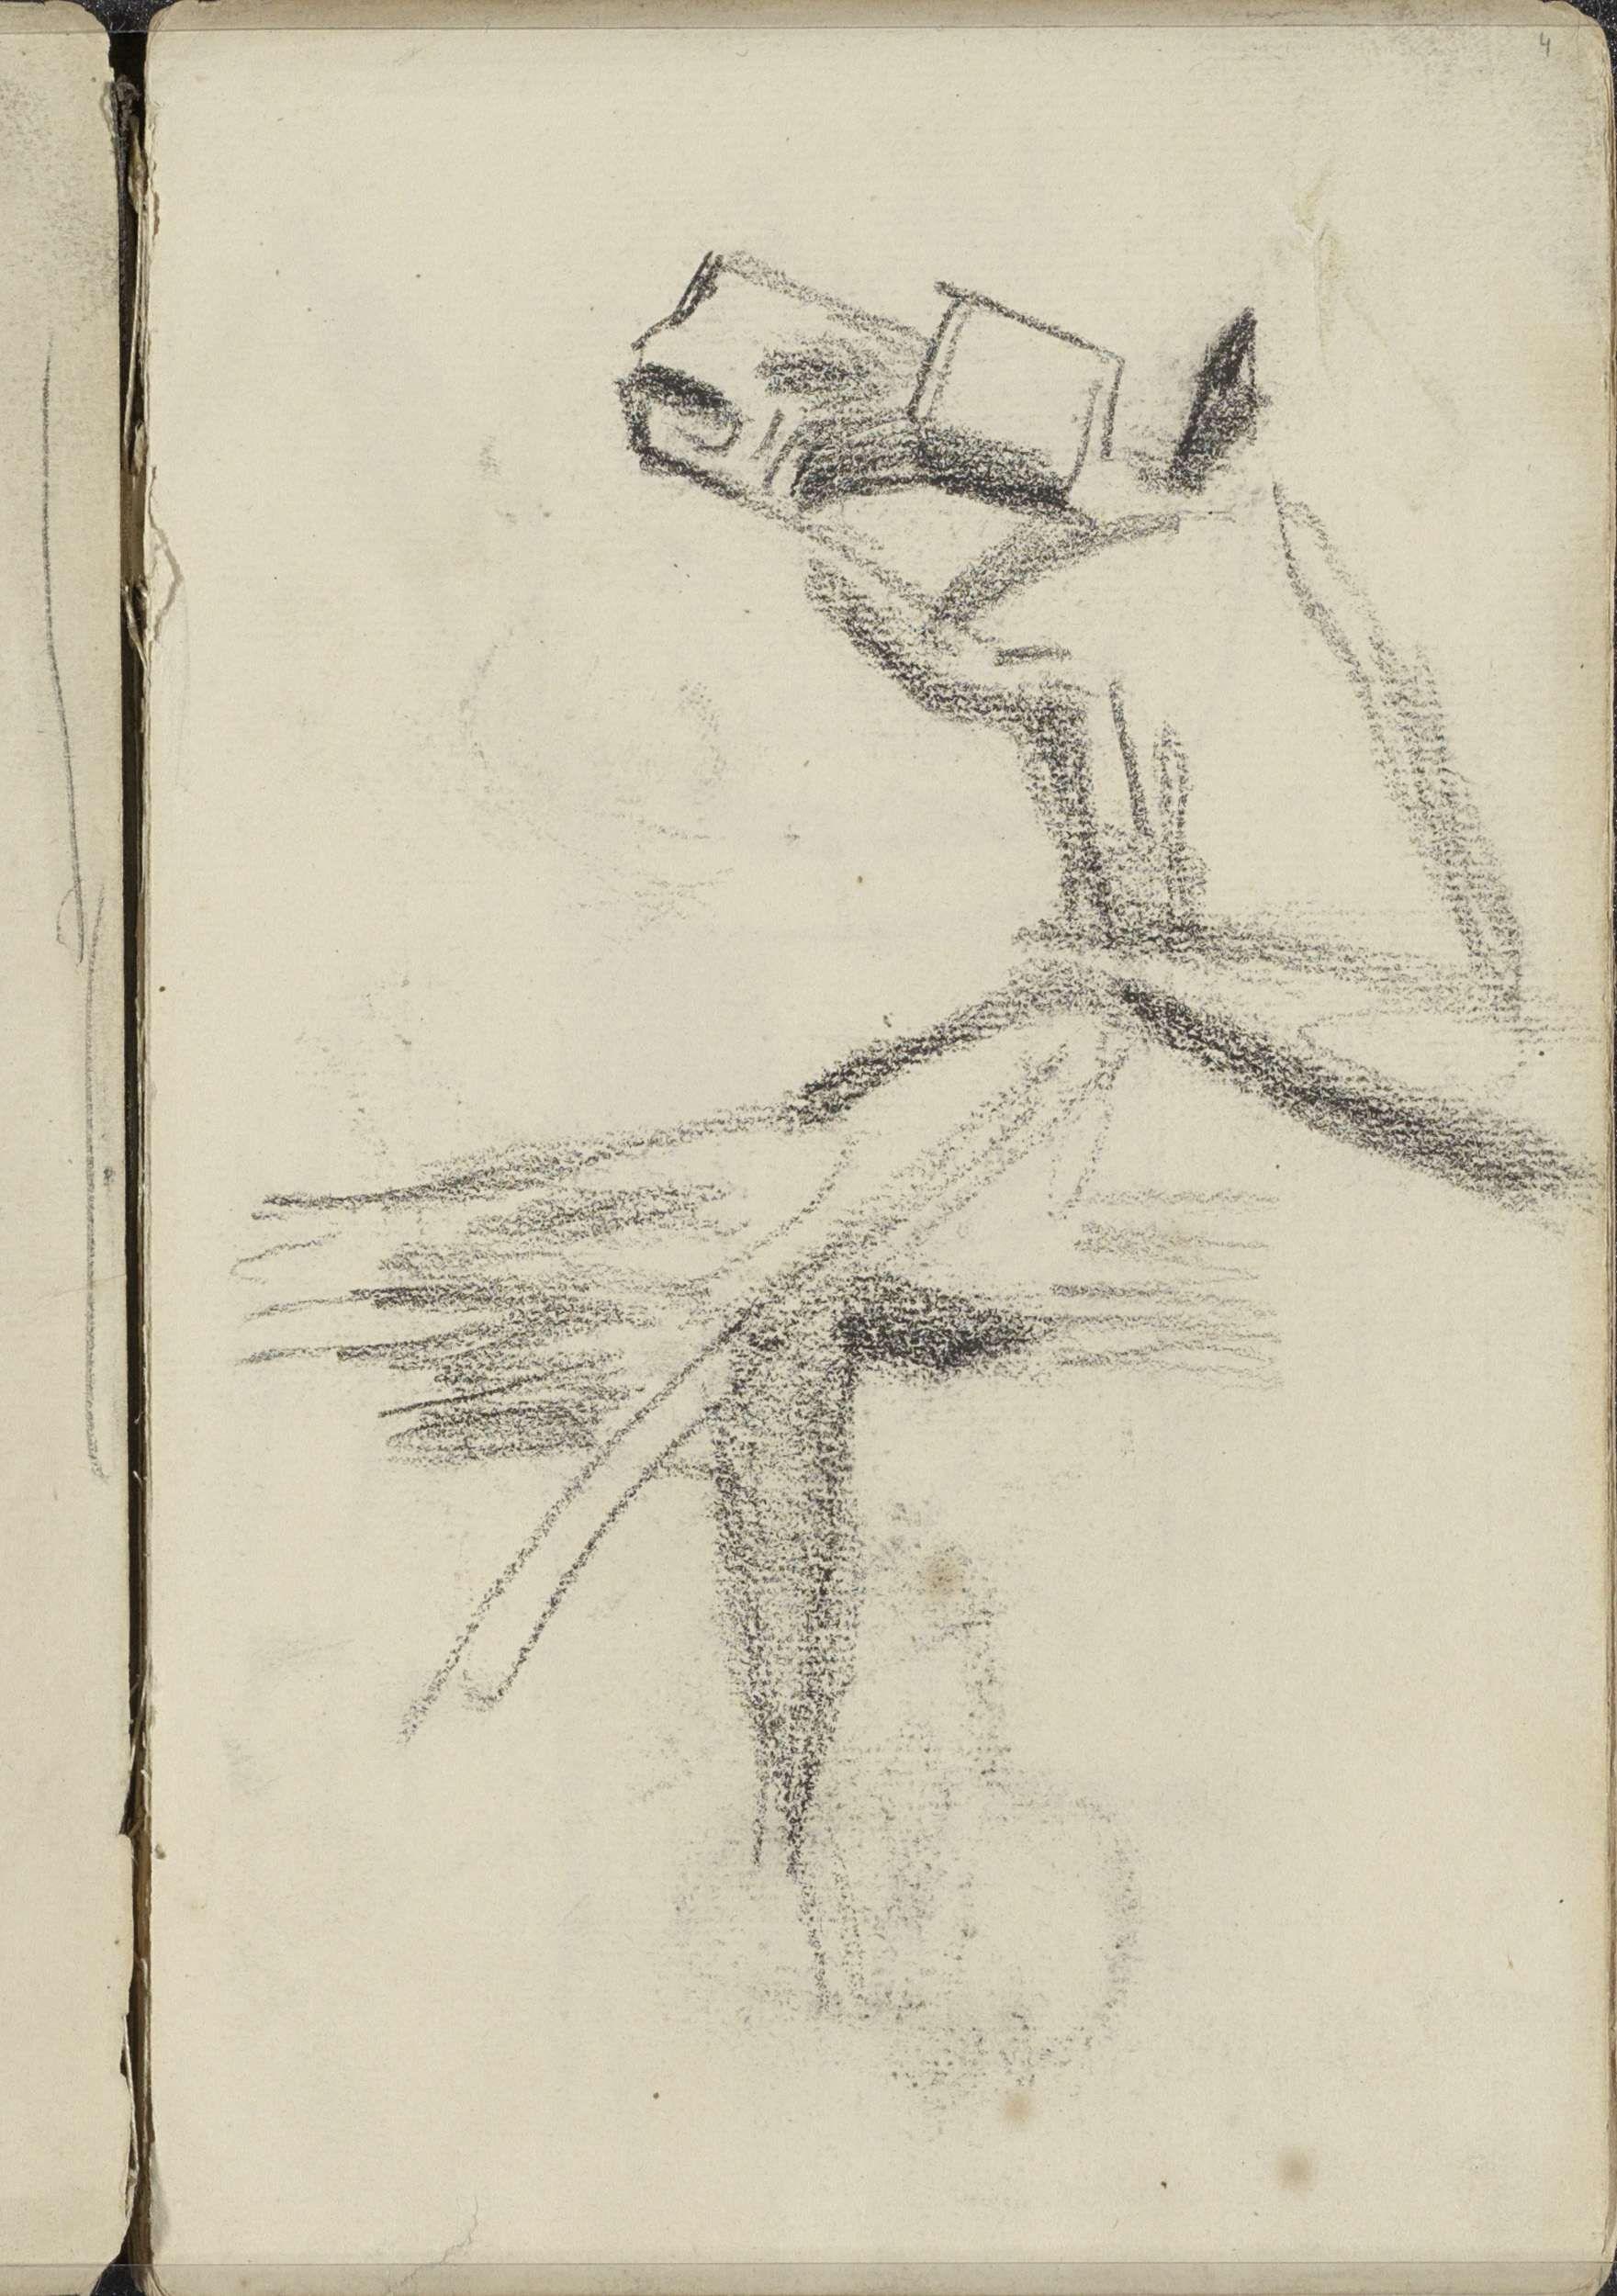 George Hendrik Breitner | Paard met oogkleppen, George Hendrik Breitner, 1886 - 1923 | Pagina 4 uit een schetsboek met 13 bladen.